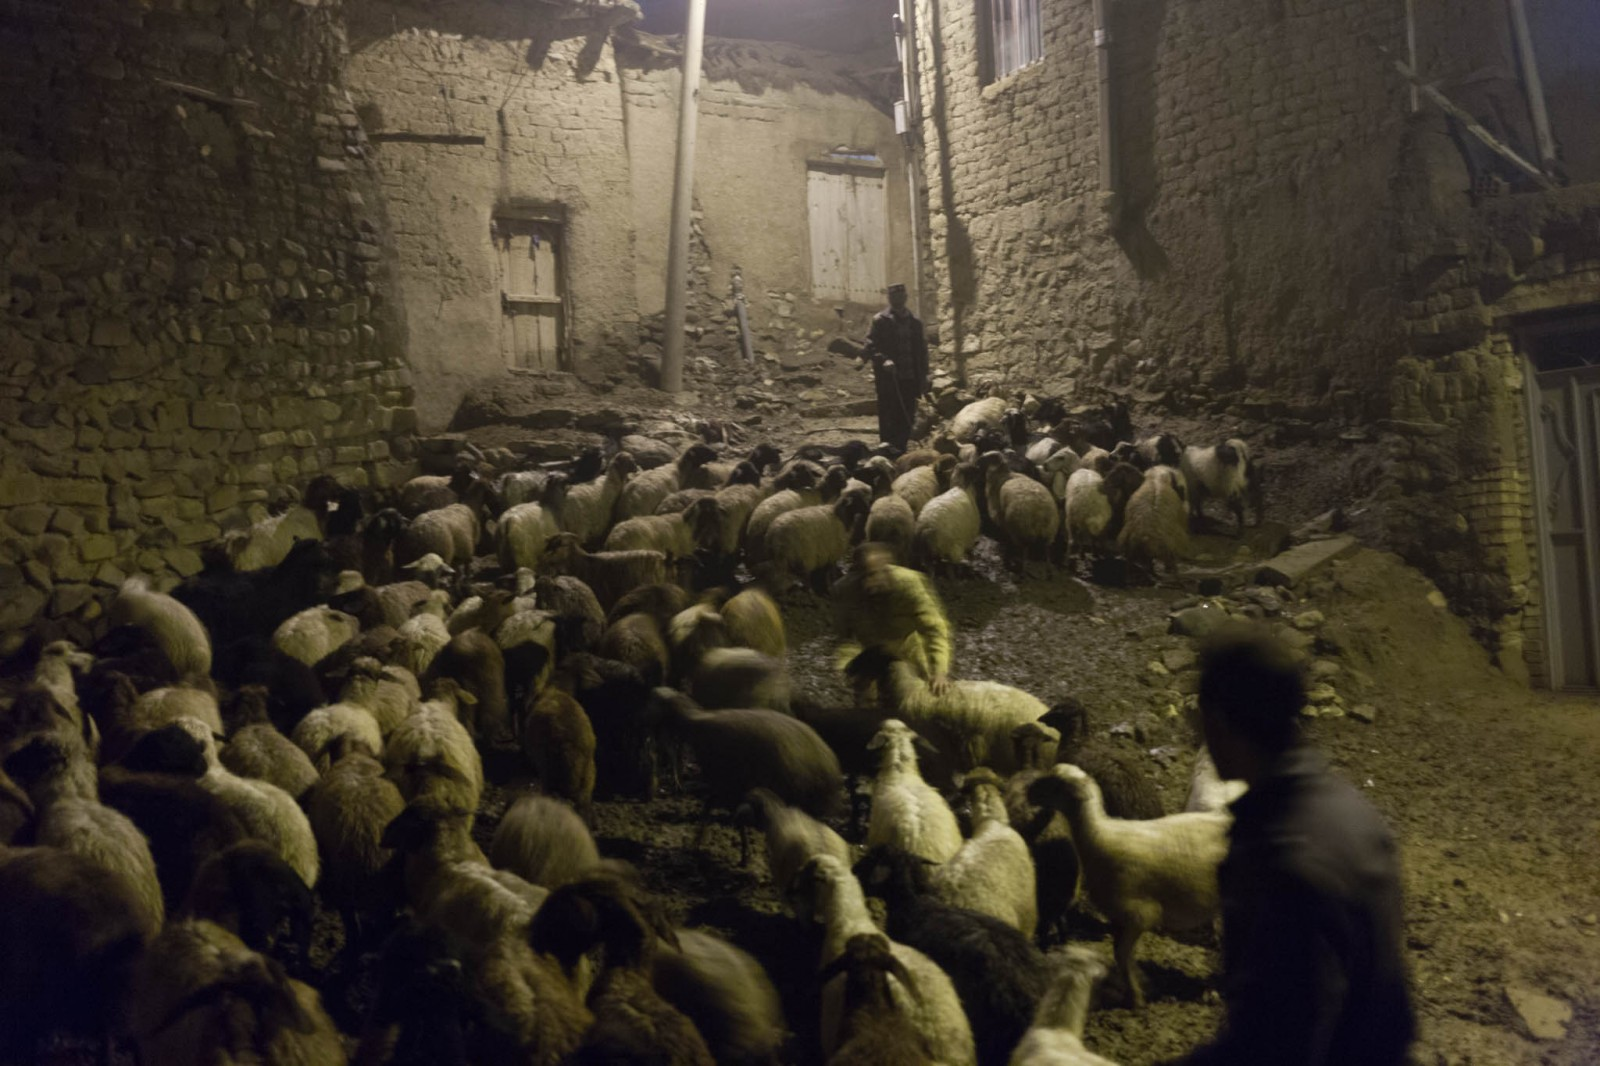 Tarzamské ovce